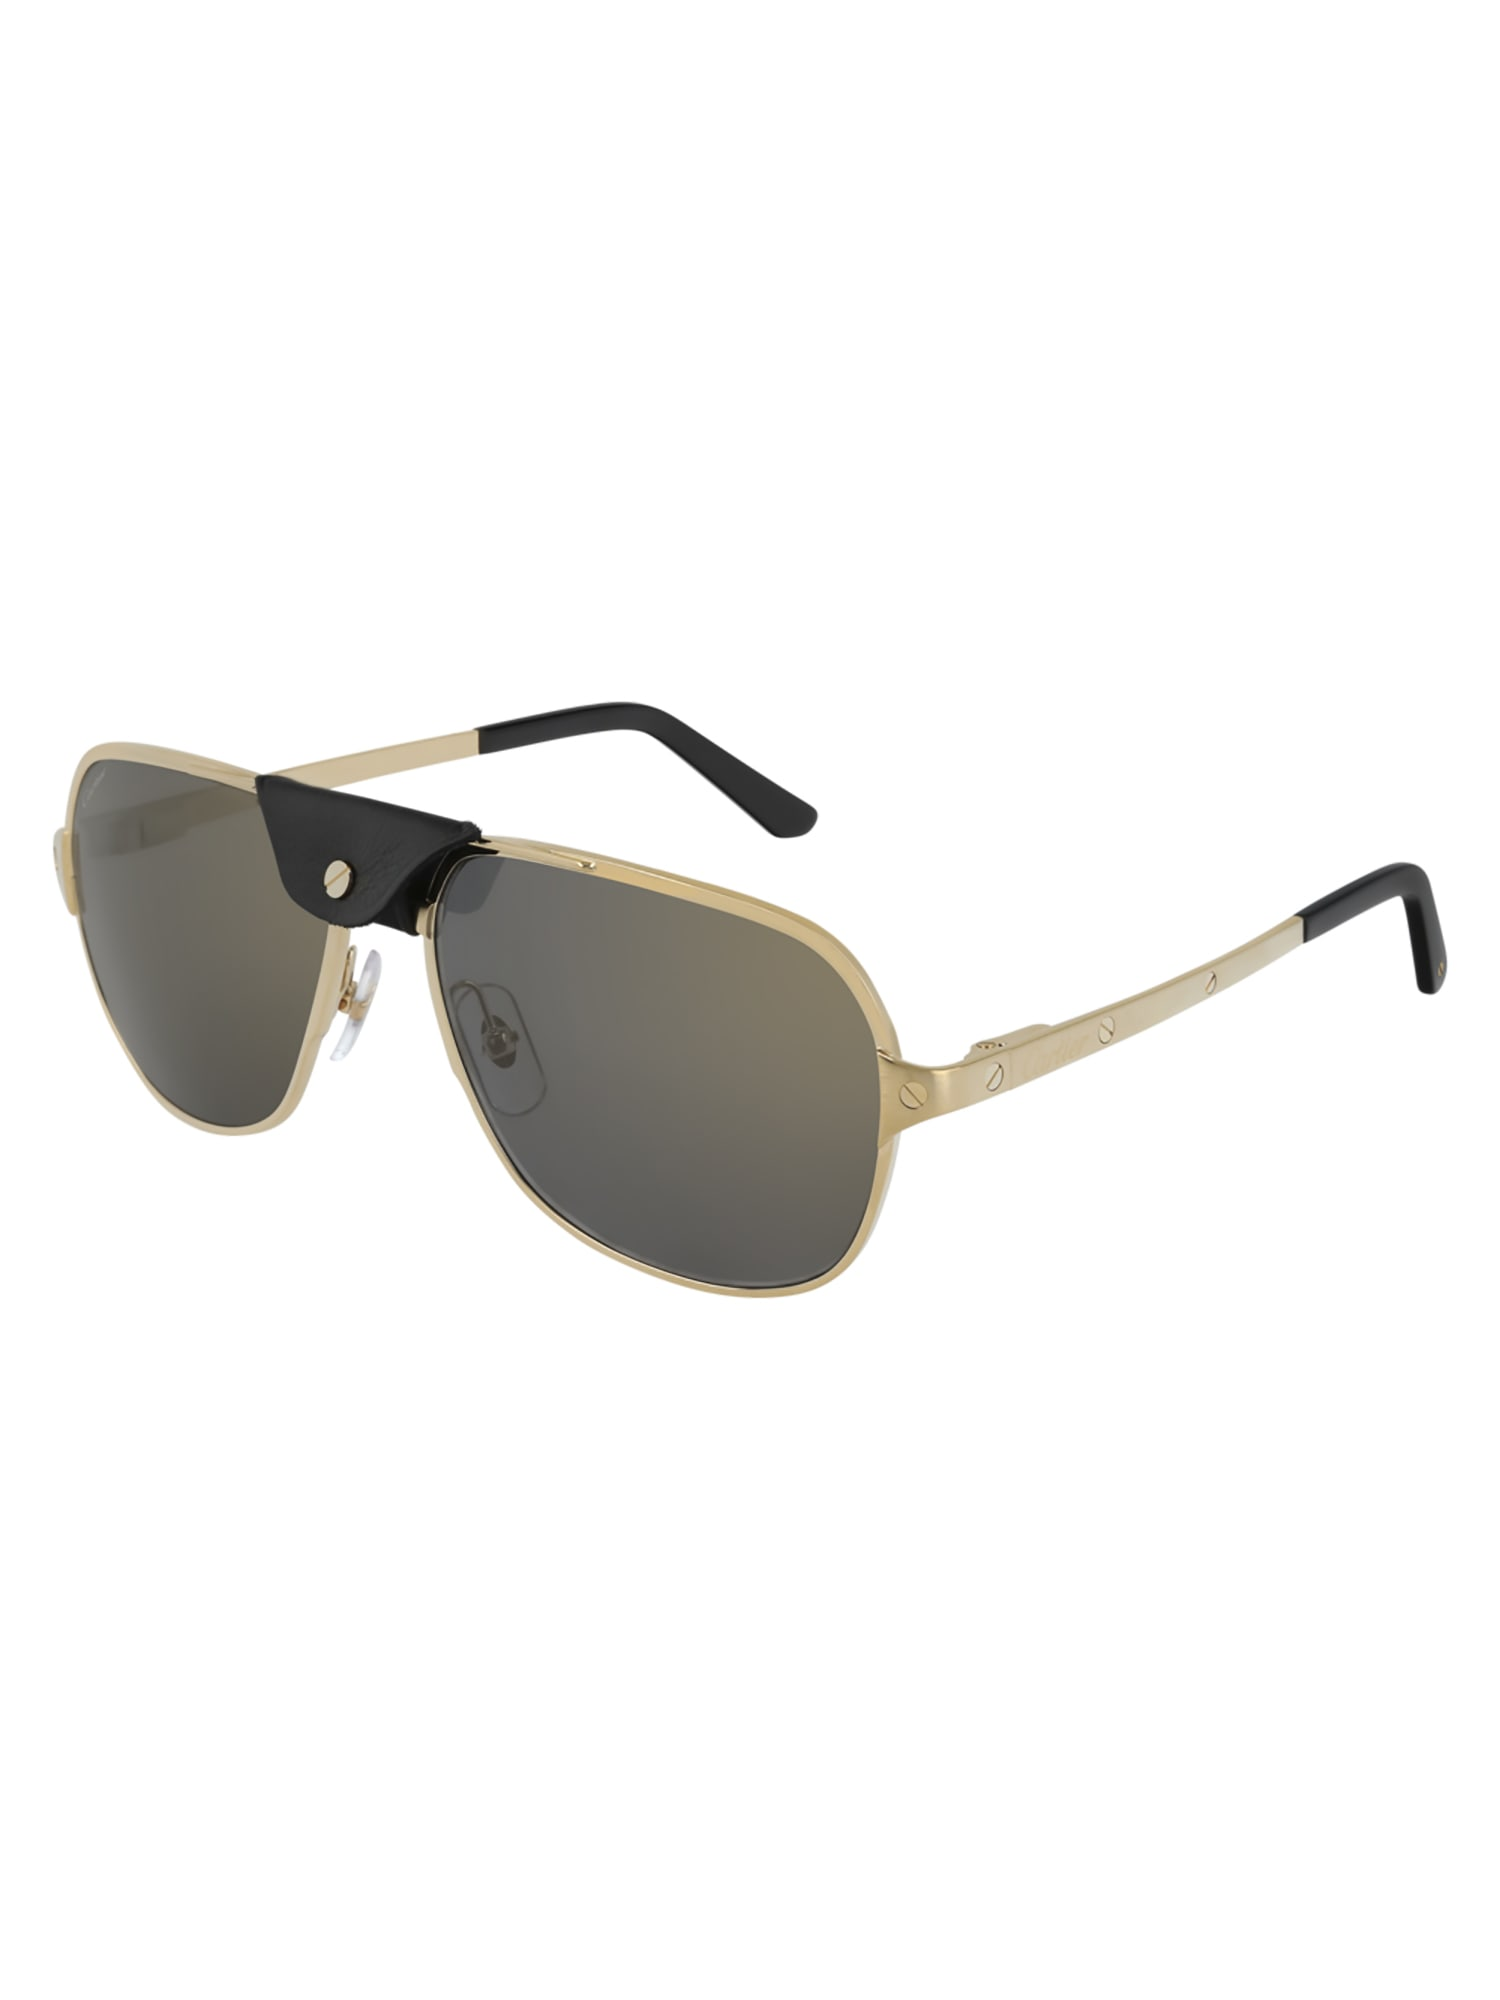 Cartier Eyewear CT0165S Sunglasses